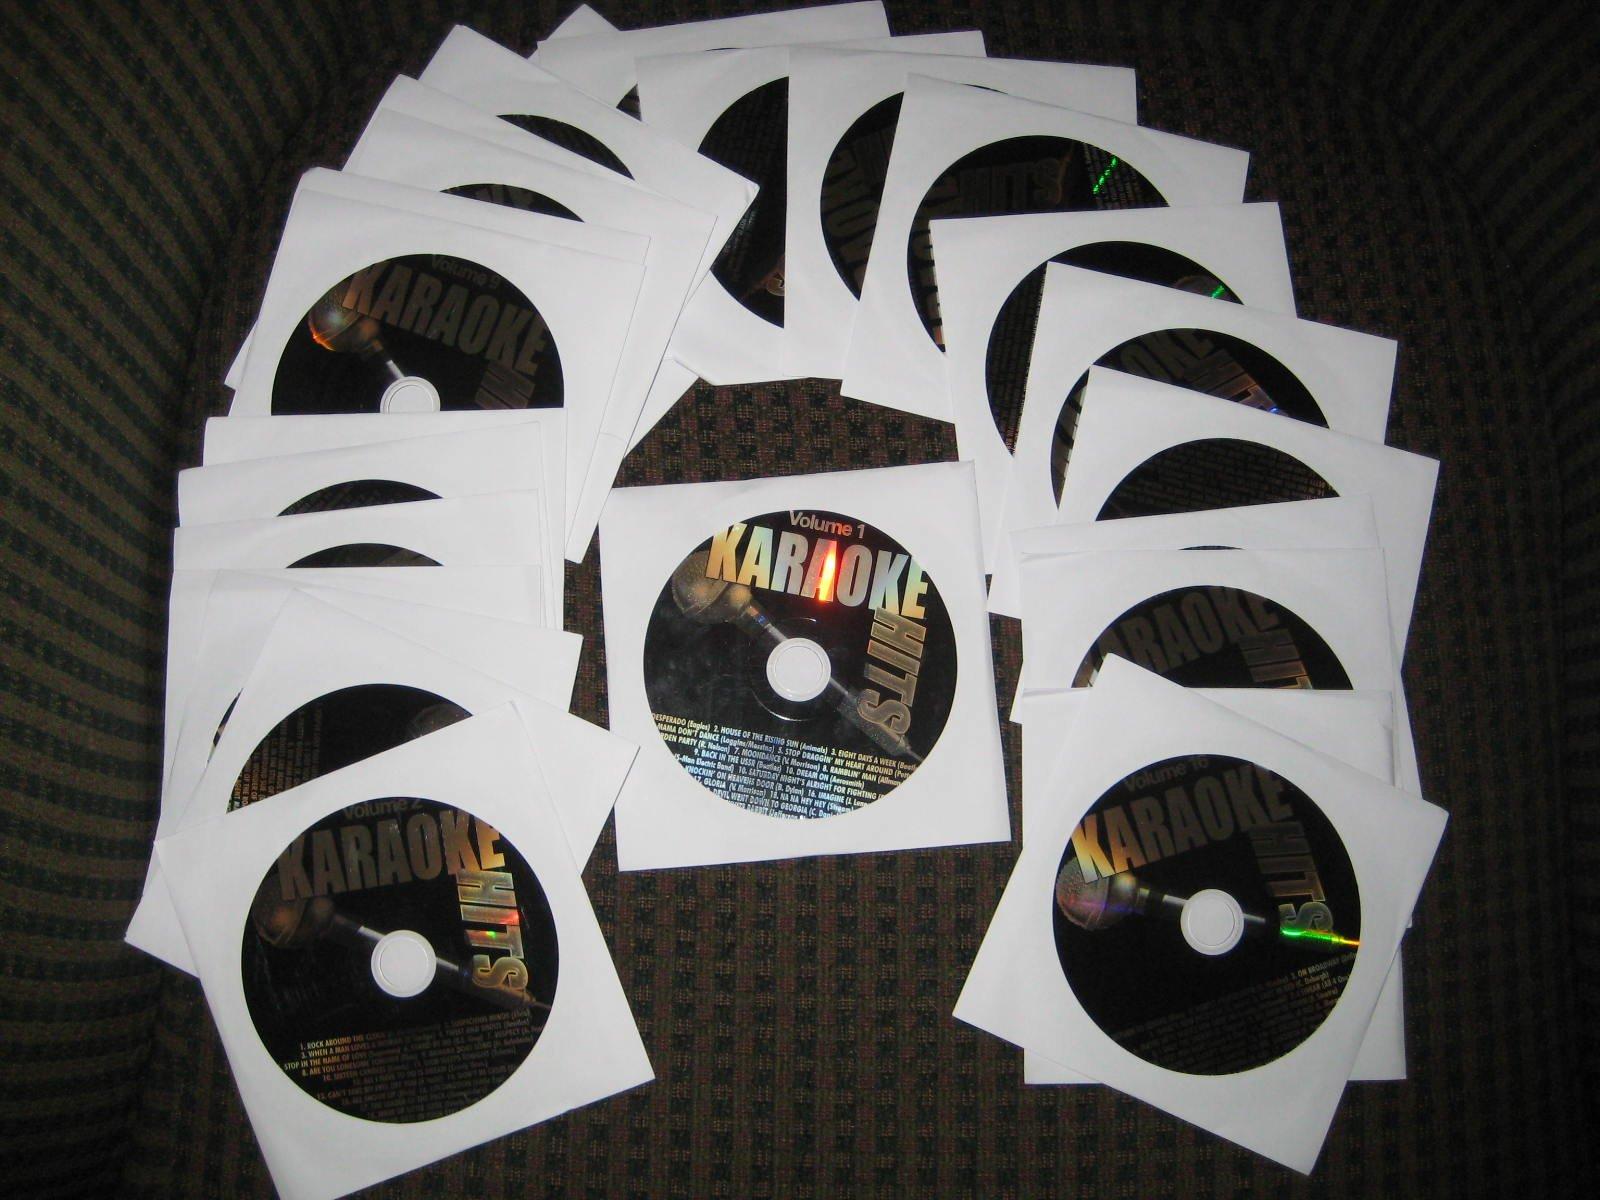 500 Song KARAOKE HITS CDG Starter/Filler: Country Pop Oldies R&B Standards by